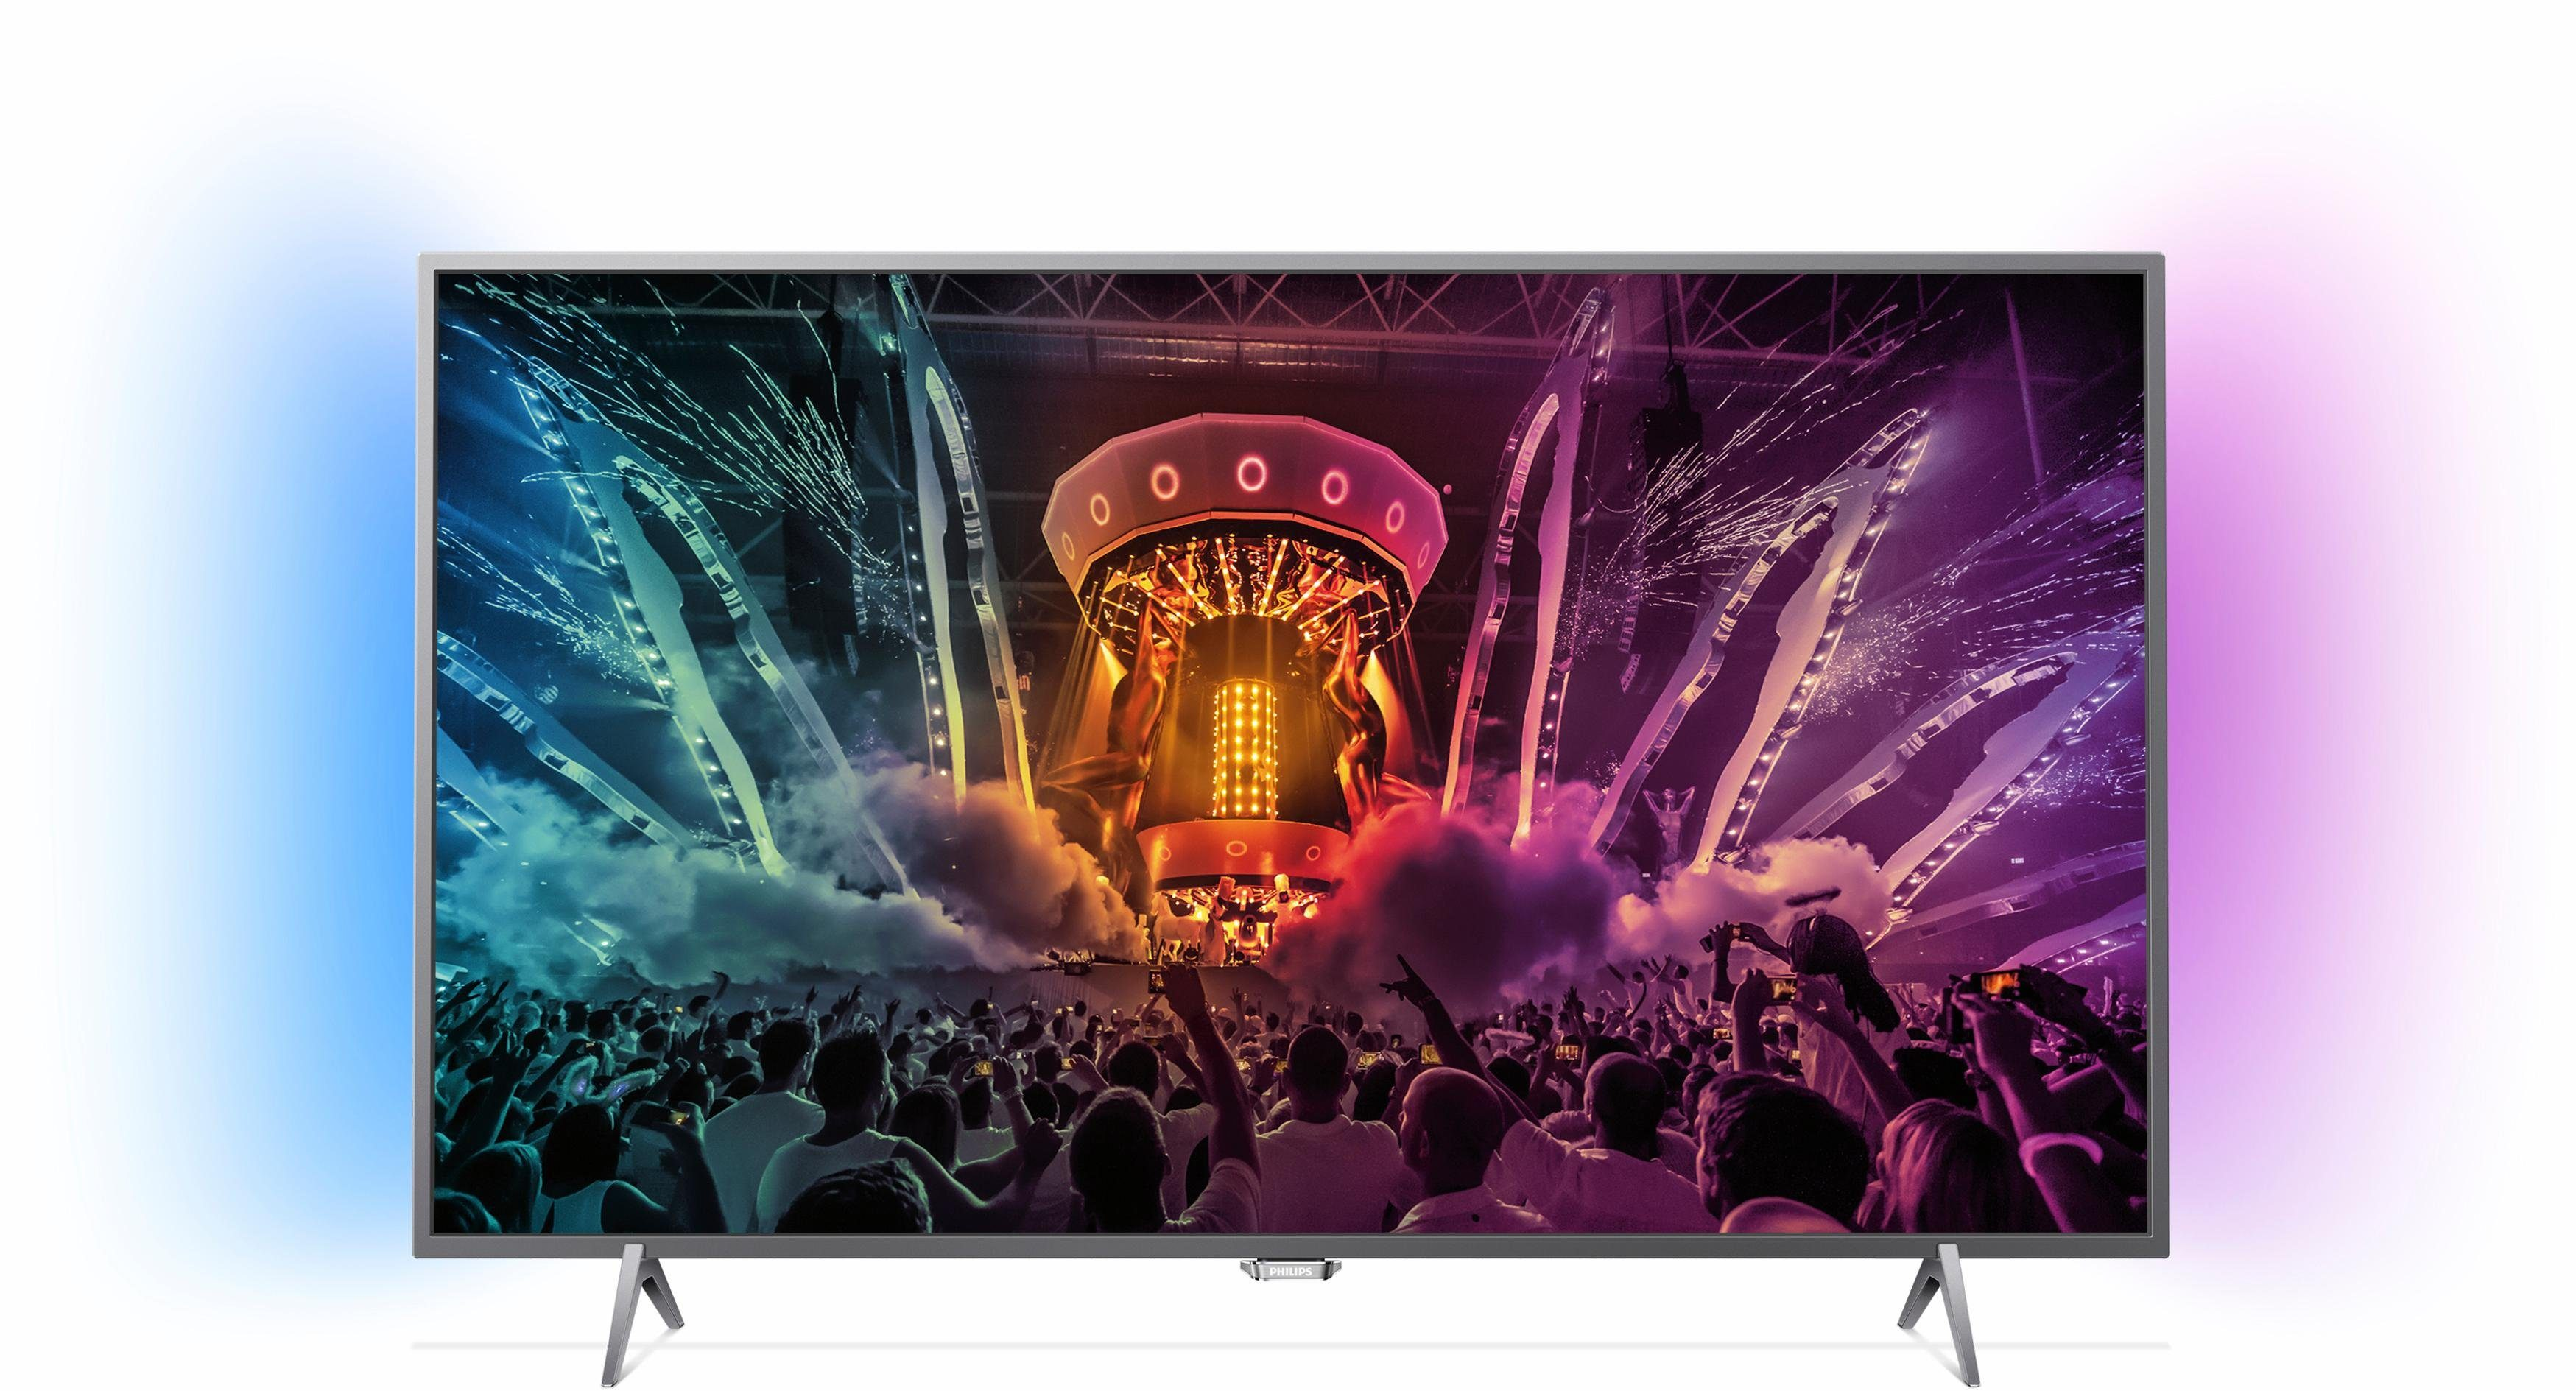 Philips 32PFS6401/12, LED Fernseher, 80 cm (32 Zoll), 1080p (Full HD) Ambilight, Smart-TV